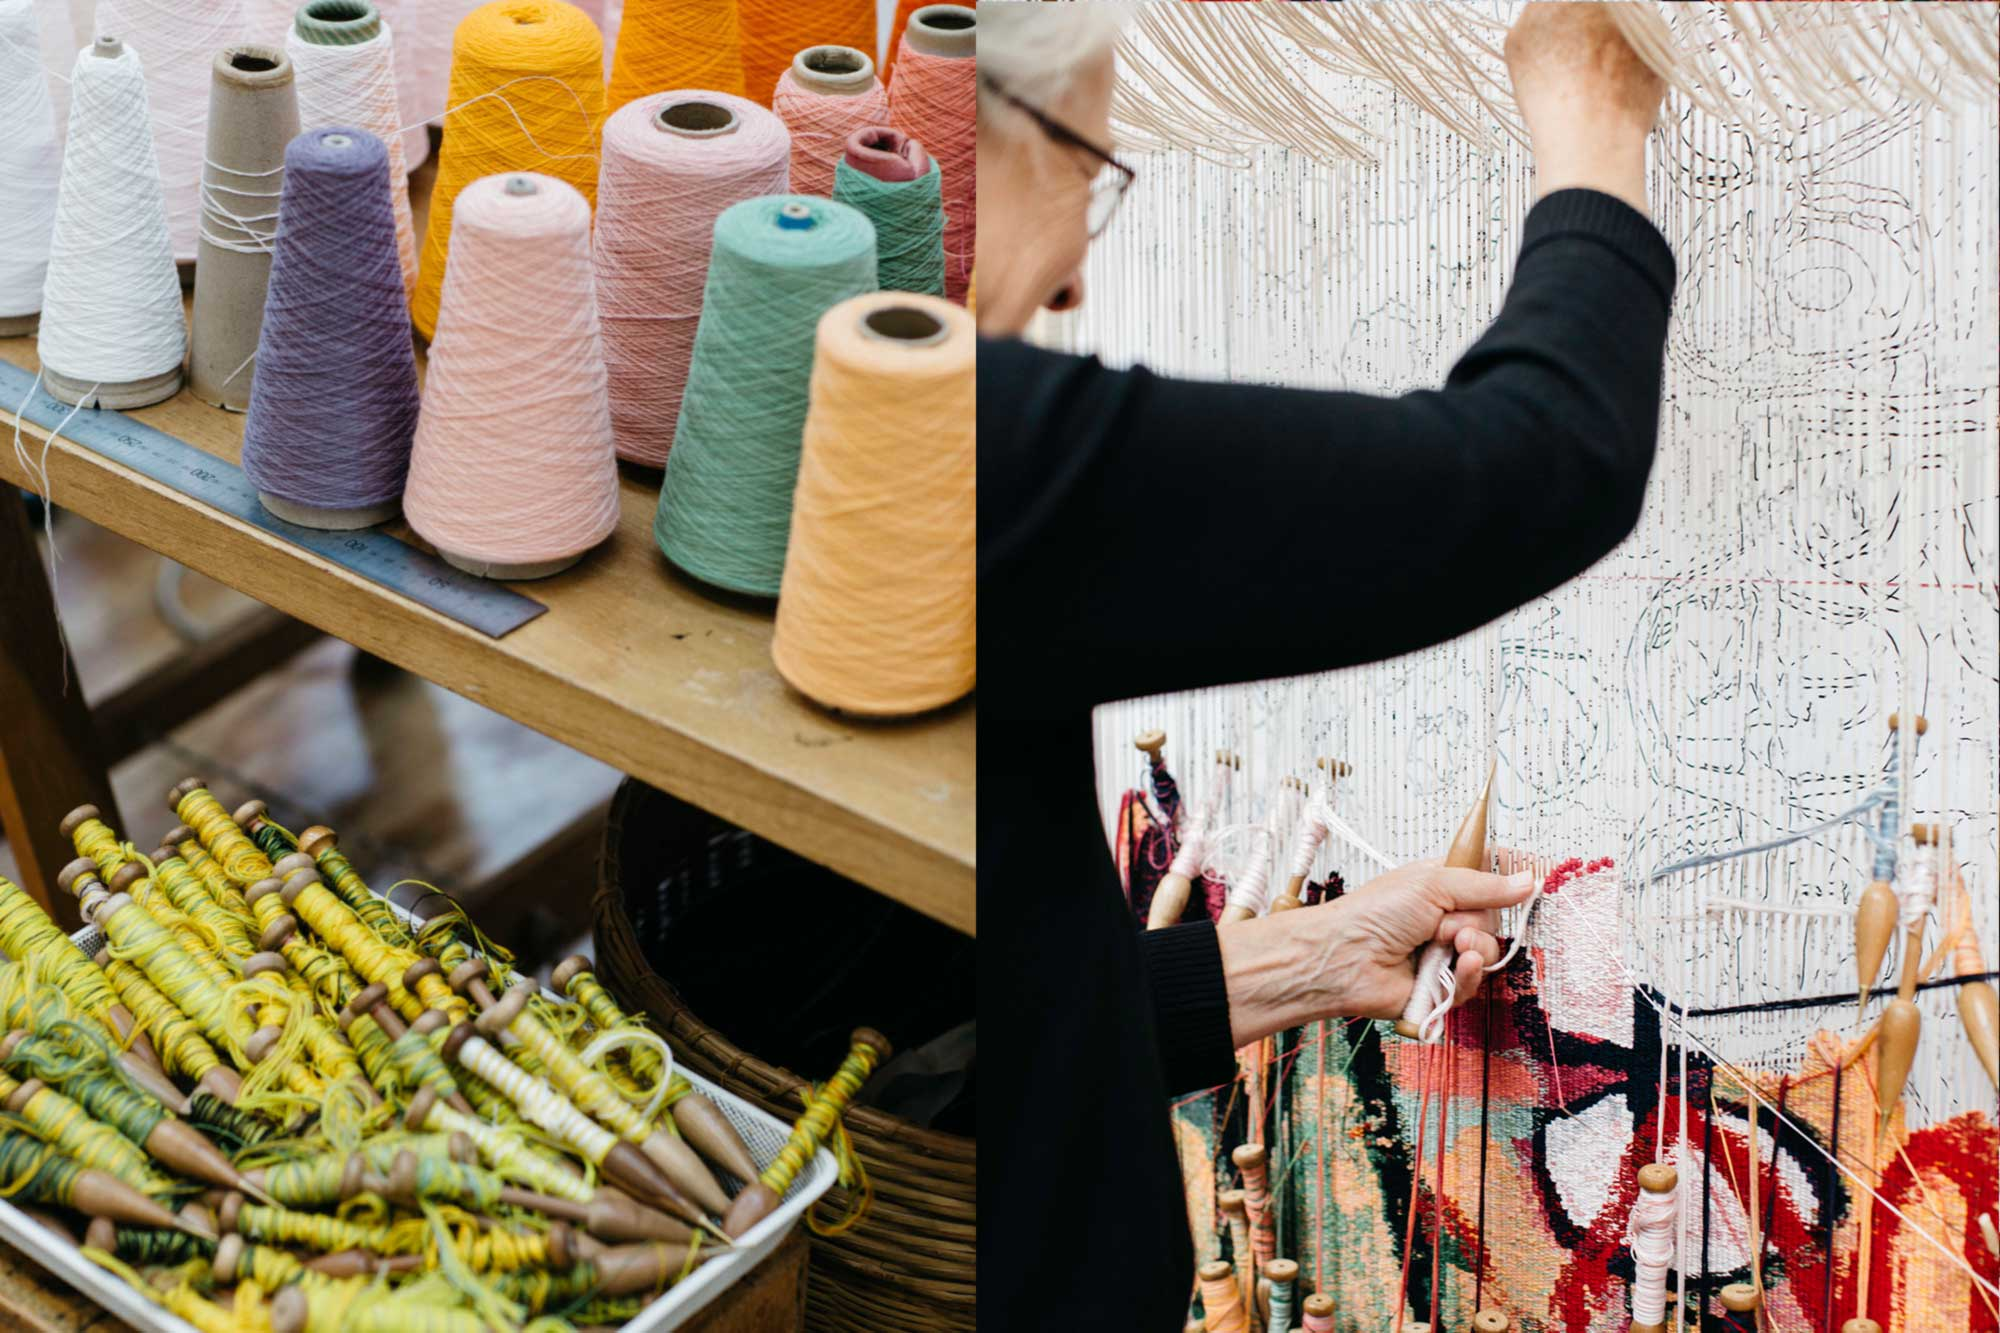 Left to right: Tapestry bobbins and yarn; Pamela Joyce weaves 'The Royal Harvest' tapestry, designed by Naomi Hobson and woven by Pamela Joyce, Sue Batten, Tim Gresham & Jennifer Sharpe. . Photo: Marie-Luise Skibbe.